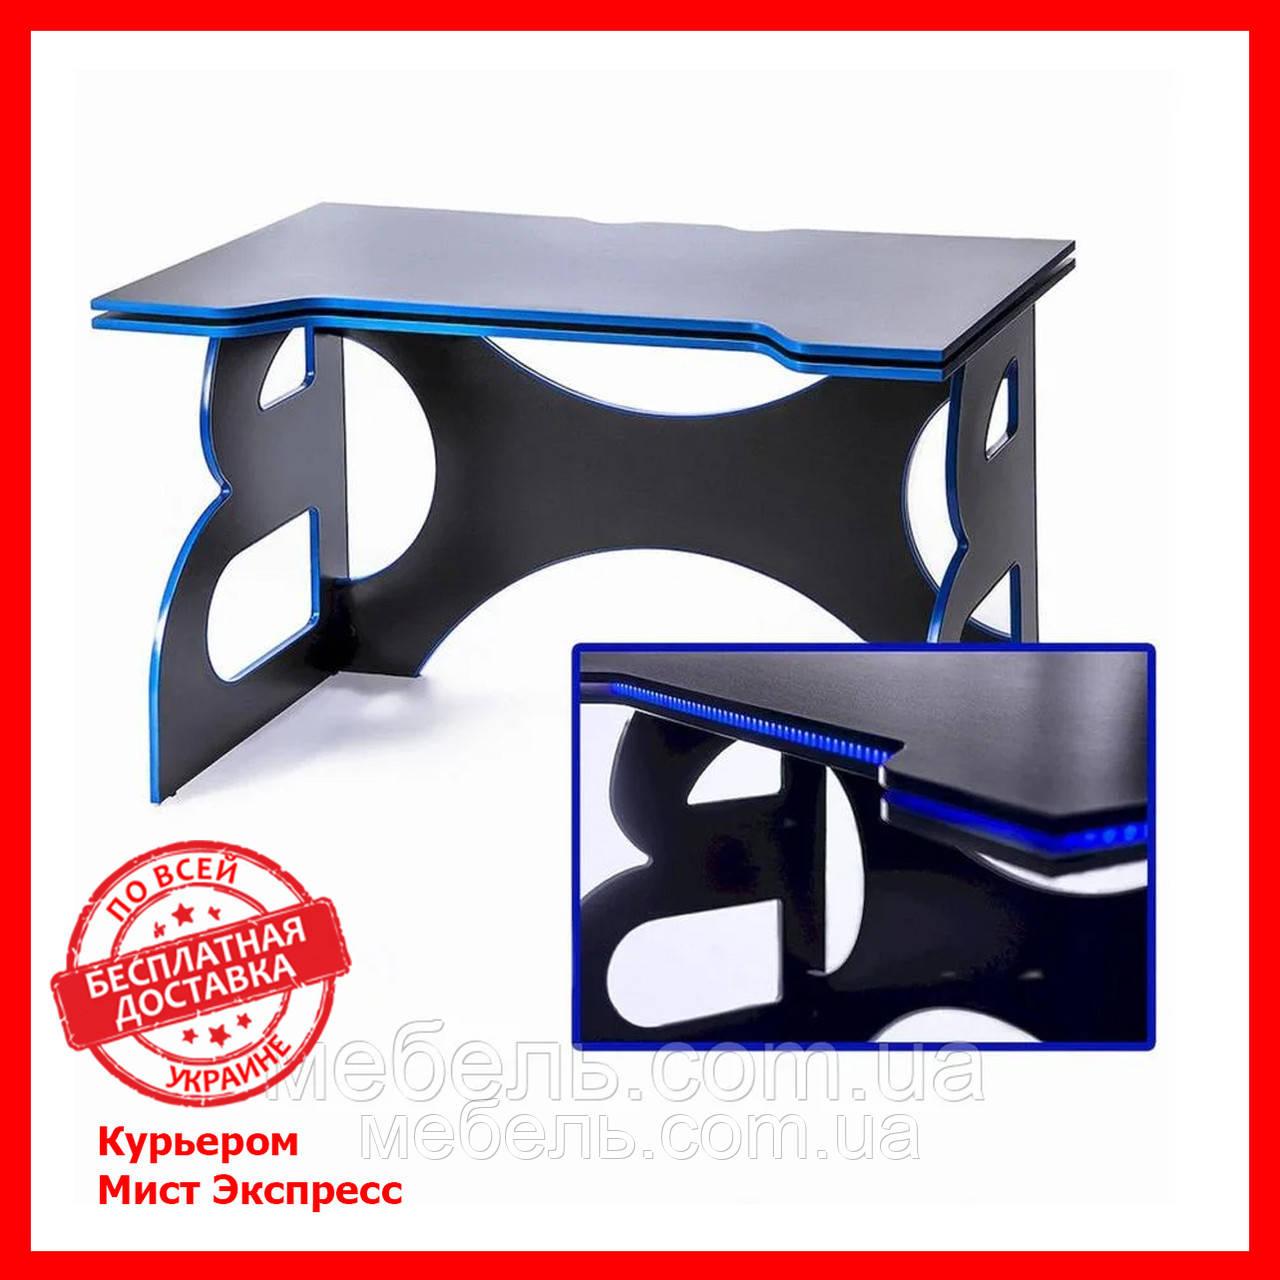 Компьютерный стол с тумбой Barsky Game Blue HG-04/LED/СUP-04/ПК-01